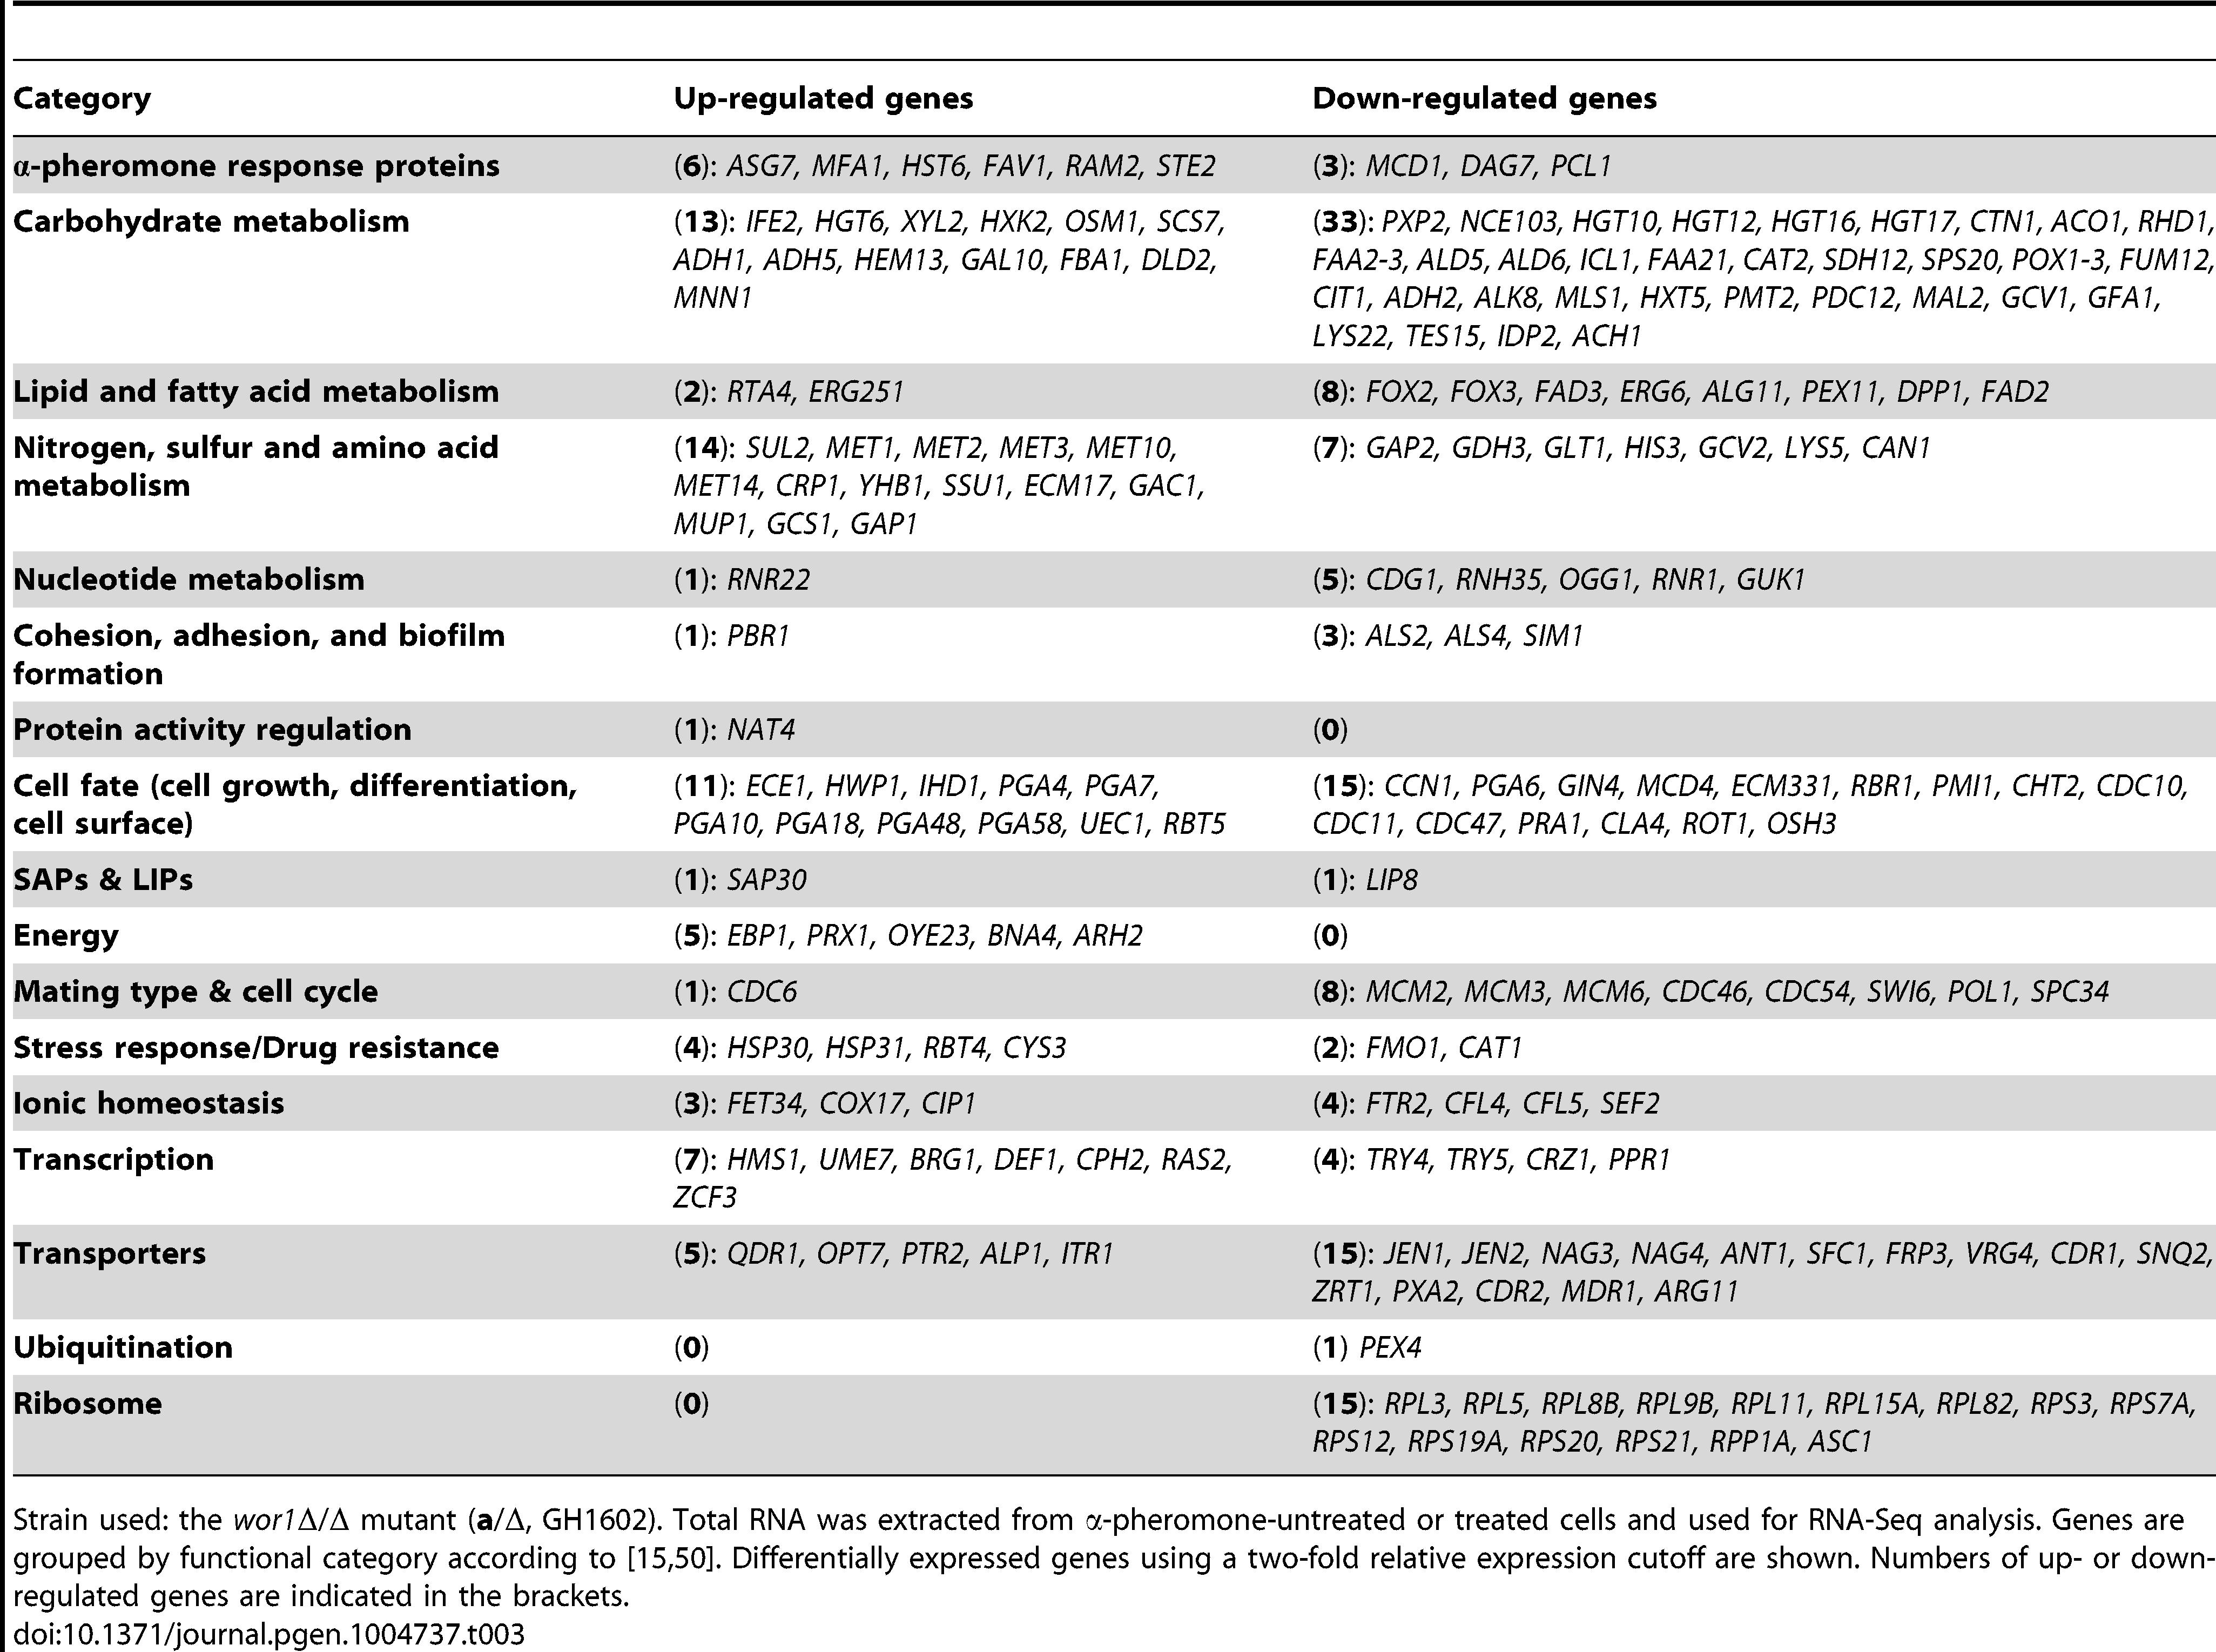 Pheromone-regulated genes in white cells.